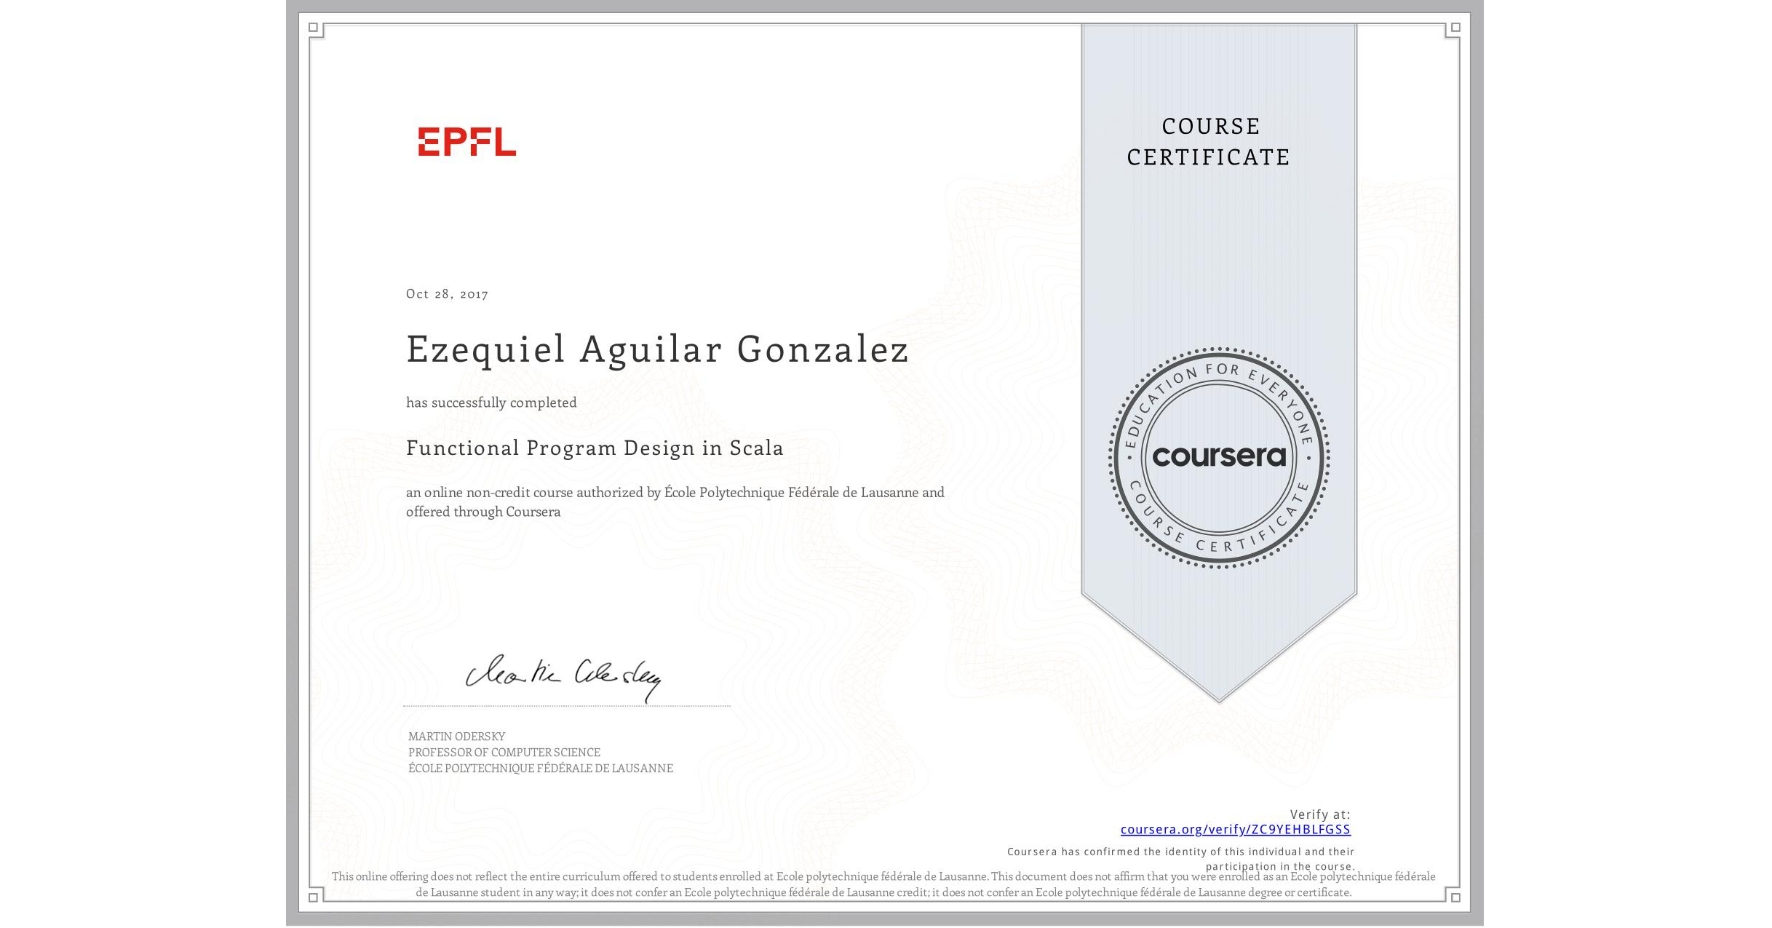 View certificate for Ezequiel Aguilar Gonzalez, Functional Program Design in Scala, an online non-credit course authorized by École Polytechnique Fédérale de Lausanne and offered through Coursera